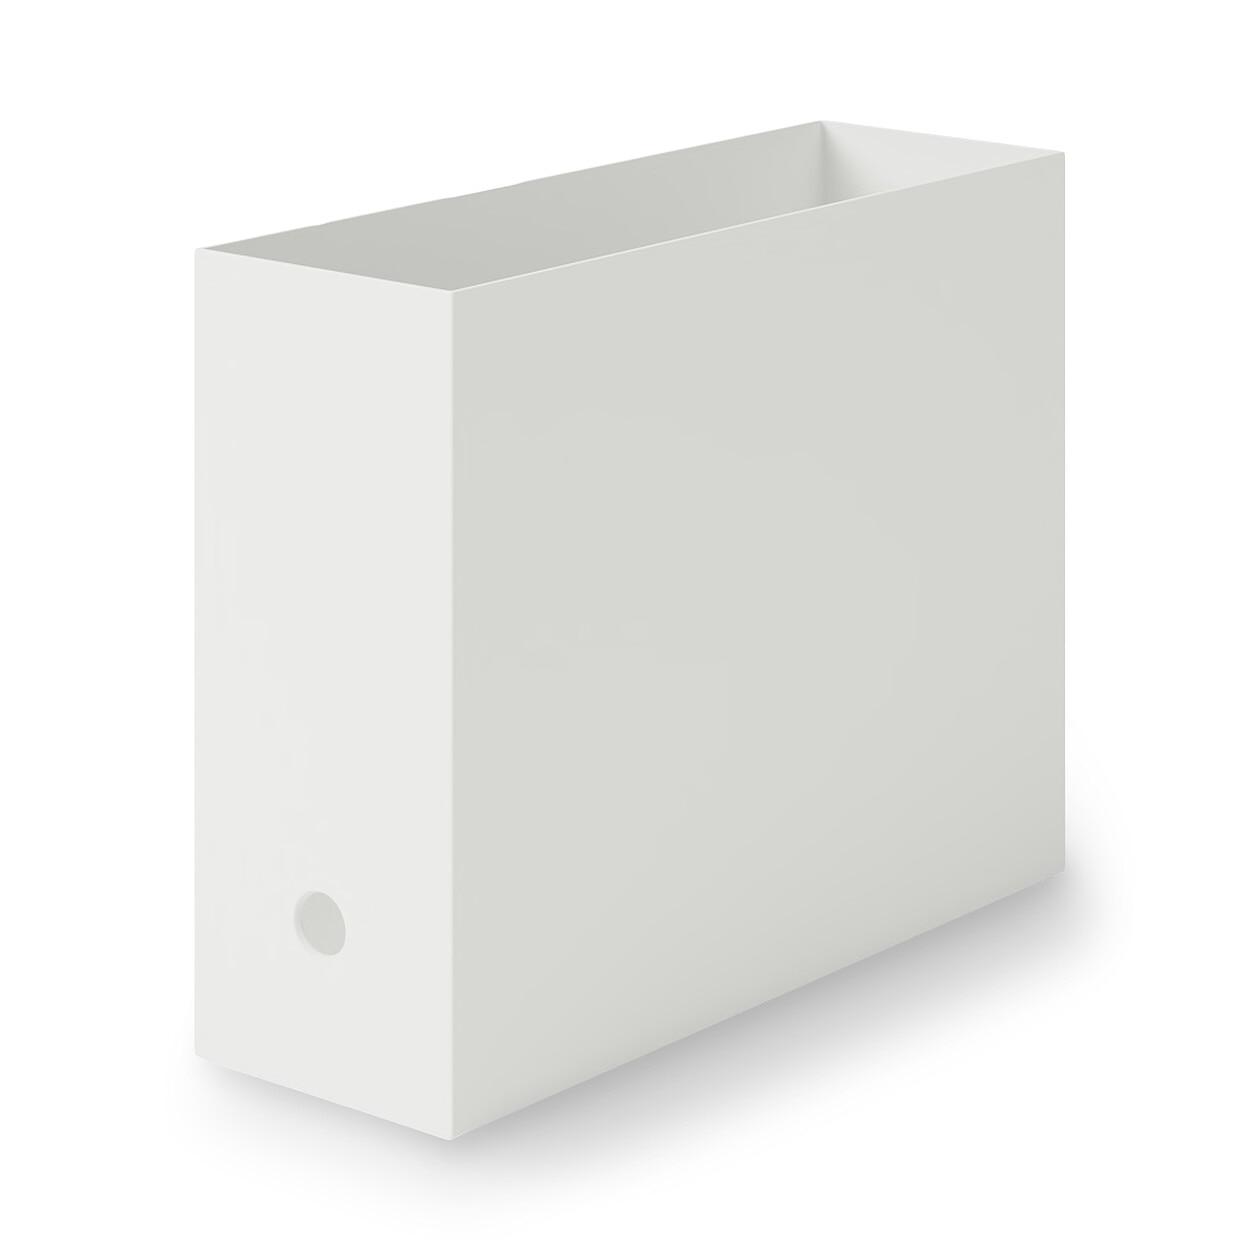 RoomClip商品情報 - ポリプロピレンファイルボックス・スタンダードタイプ・A4用 ホワイトグレー